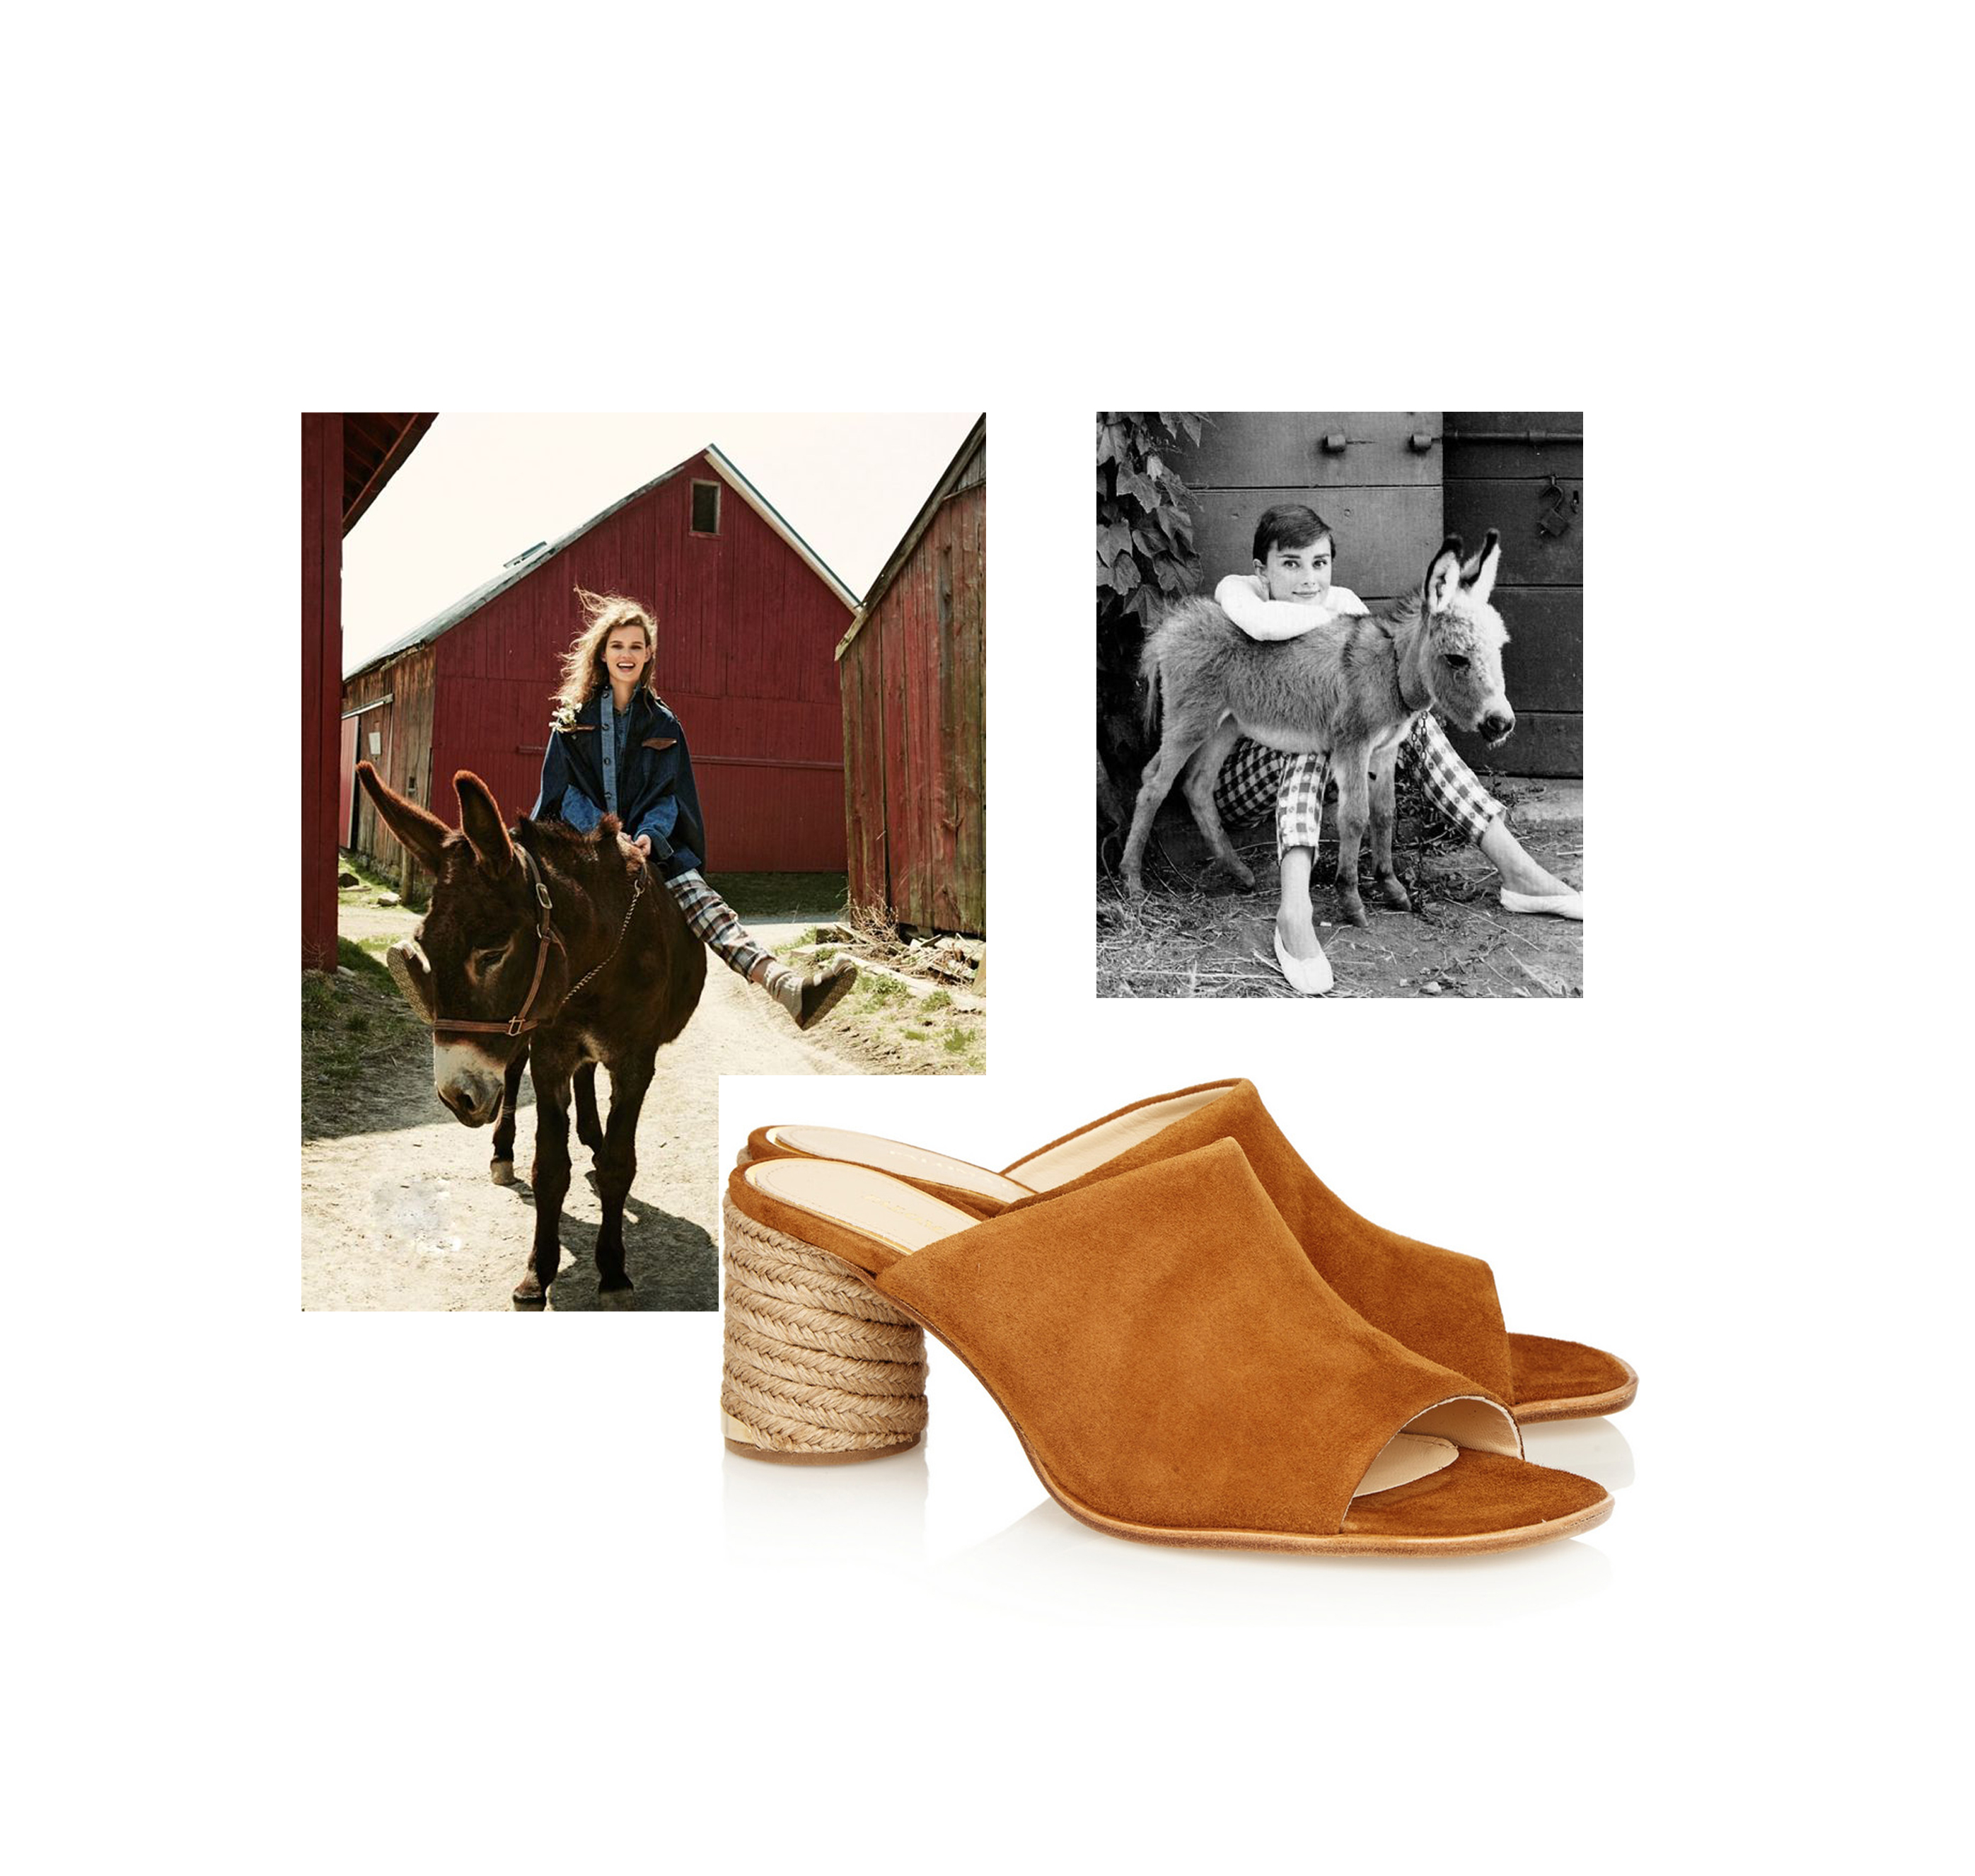 Chaussures - Mules Paloma Barcel 9KRnBNLB